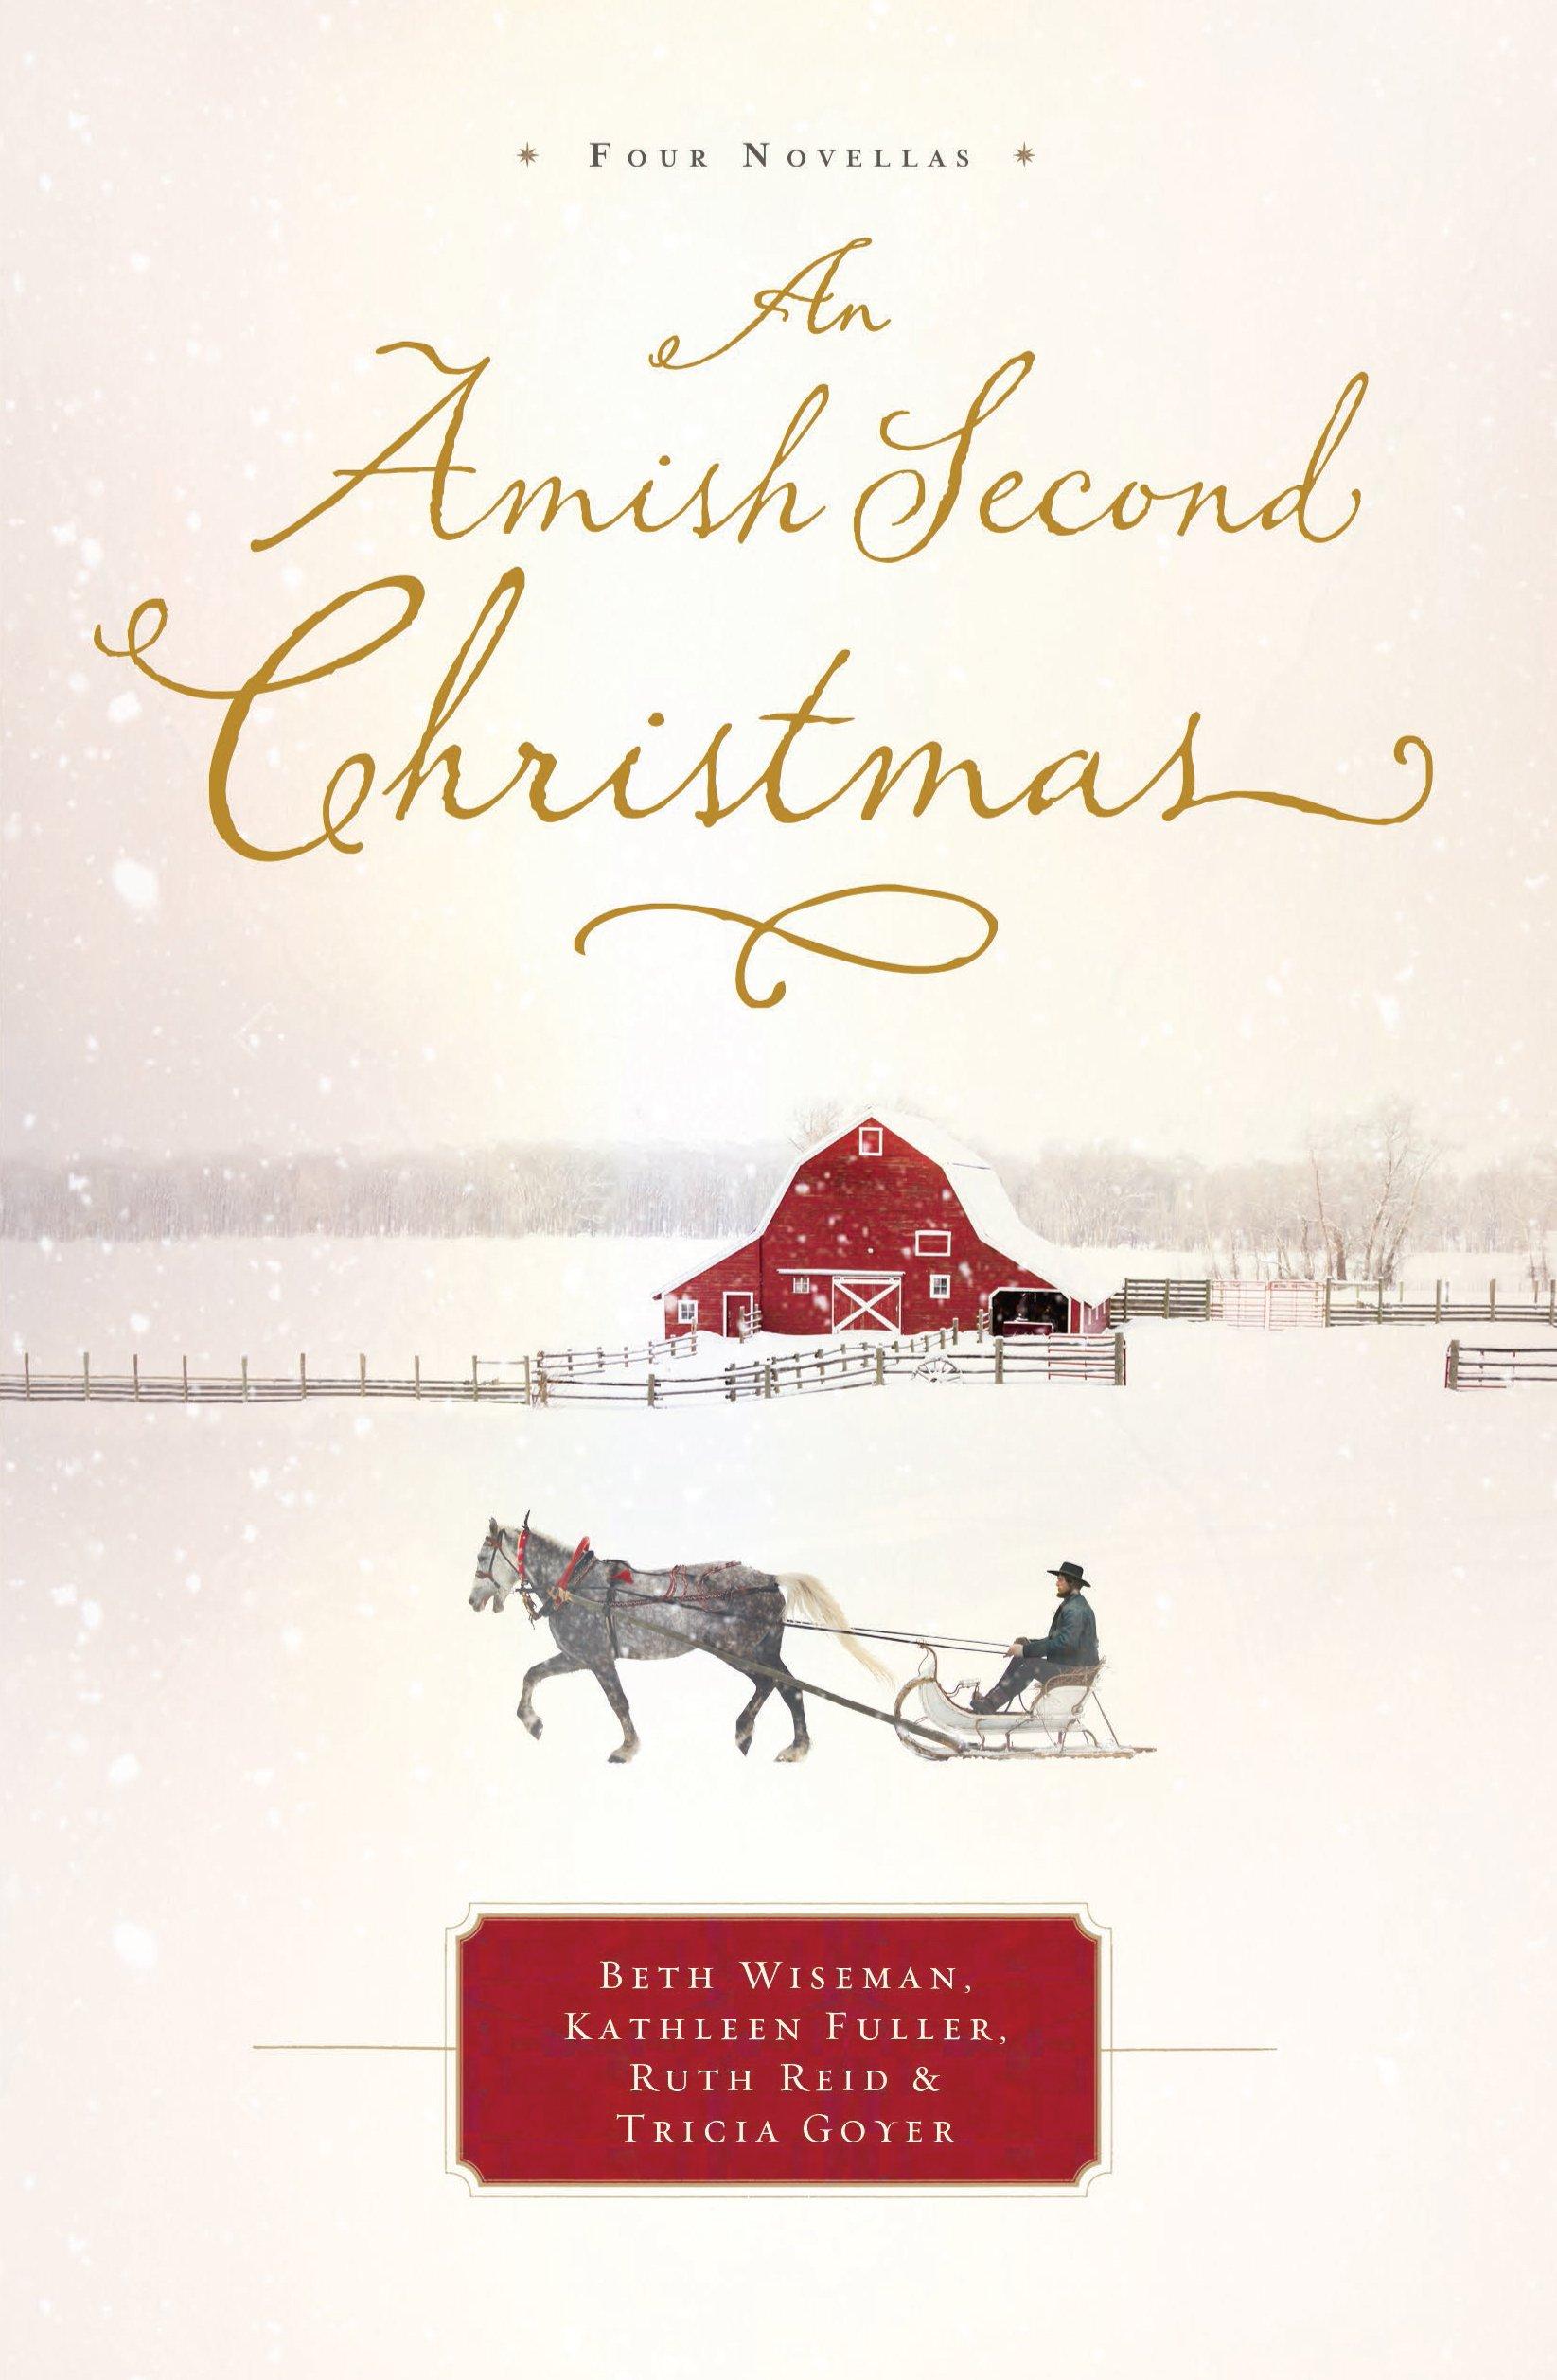 An Amish Second Christmas (Thorndike Press Large Print Christian Fiction)